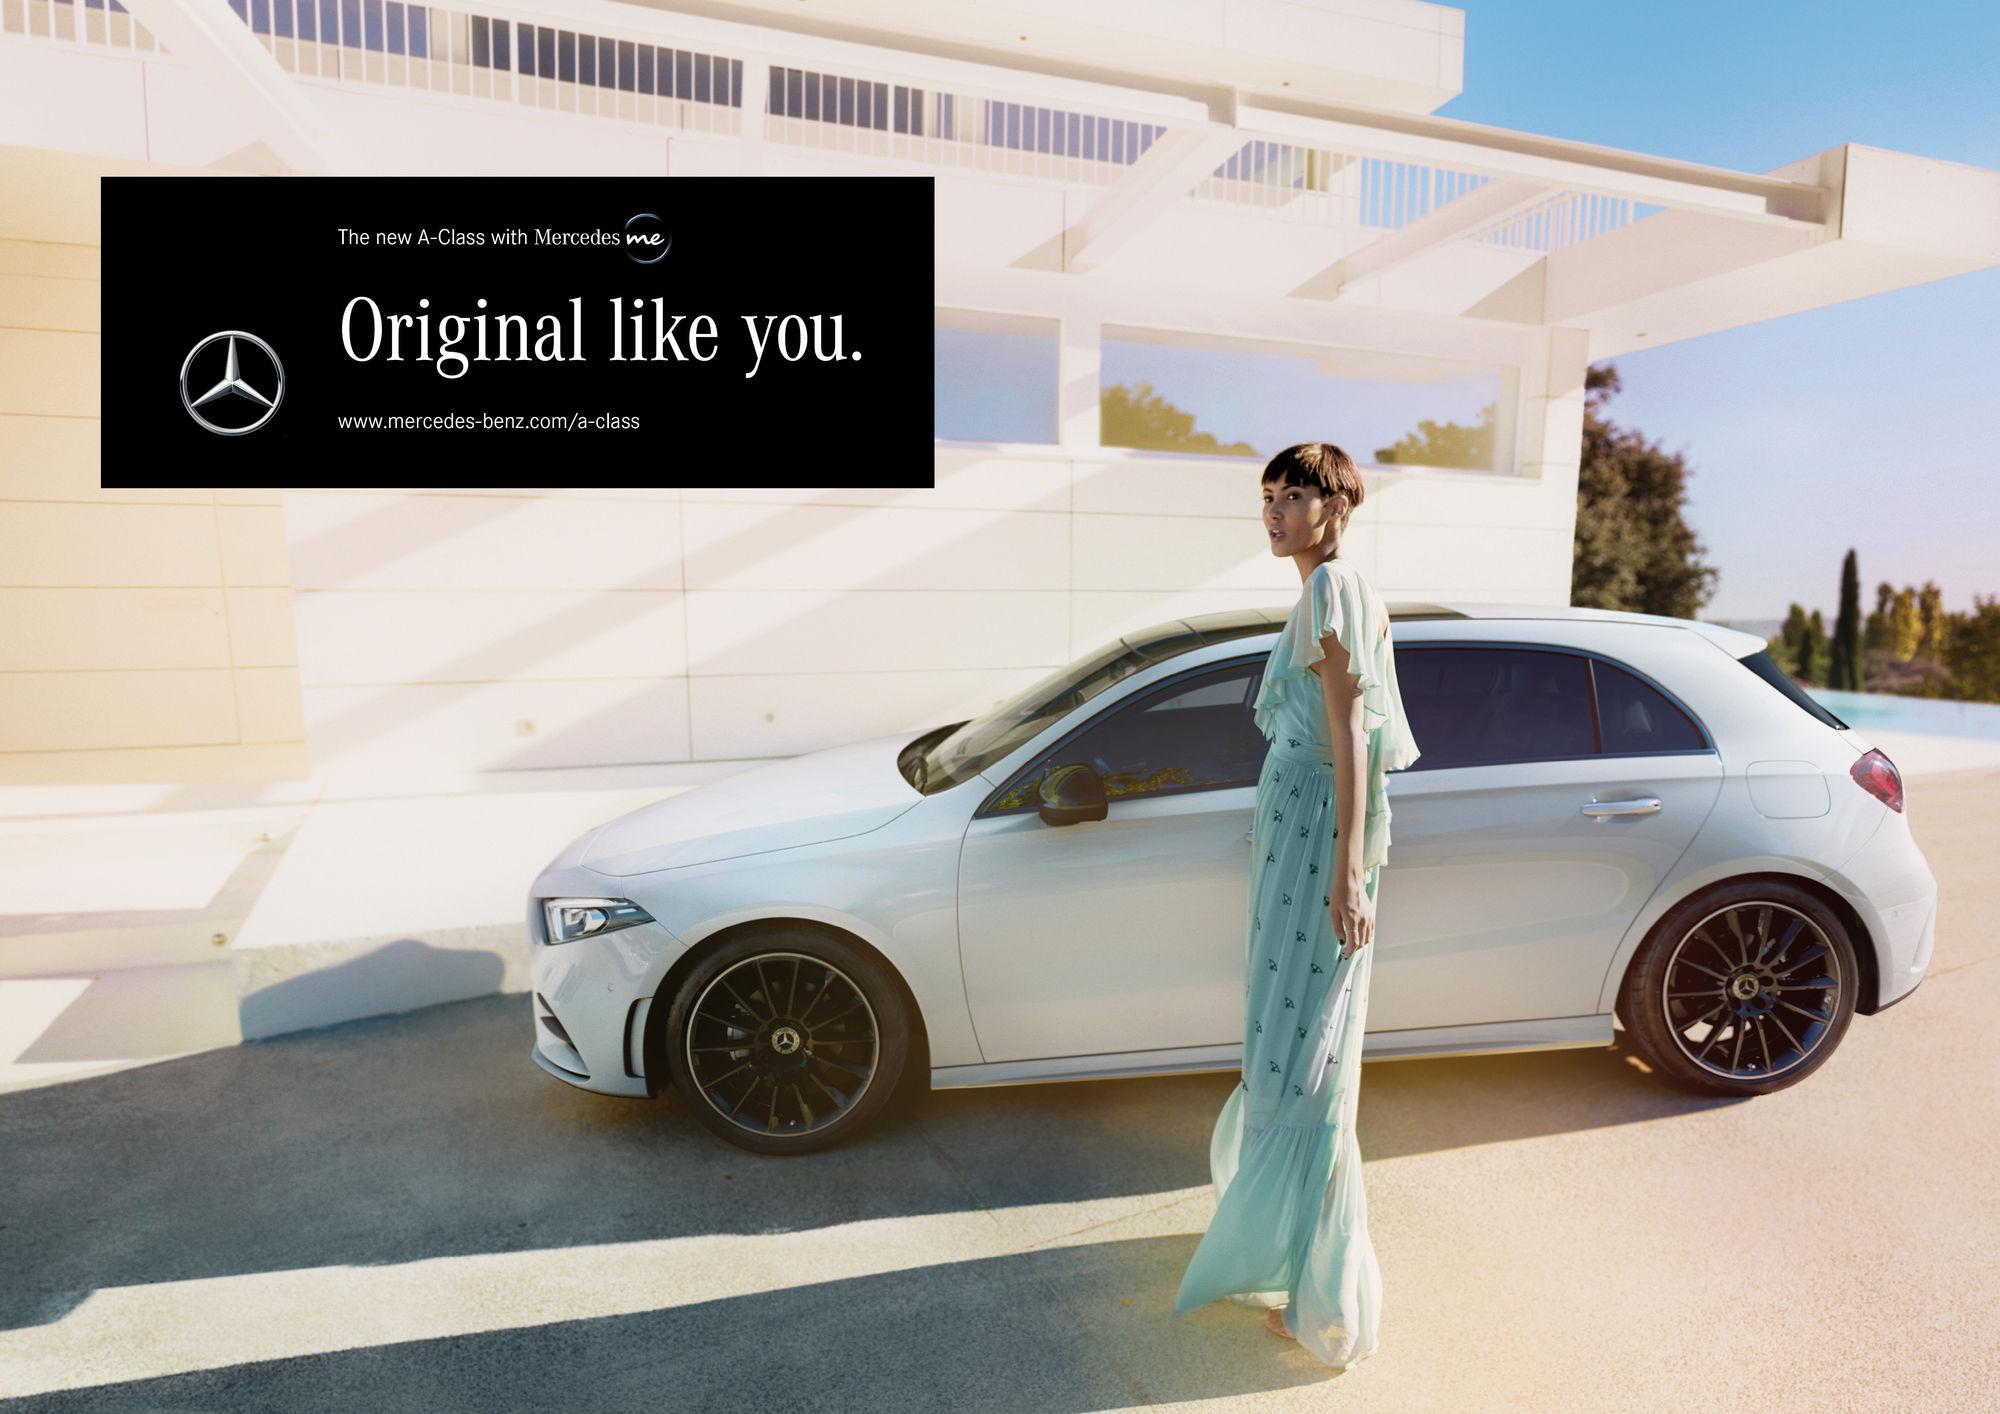 RECOM CGI : Mercedes-Benz A-Class - Lifestyle Campaign